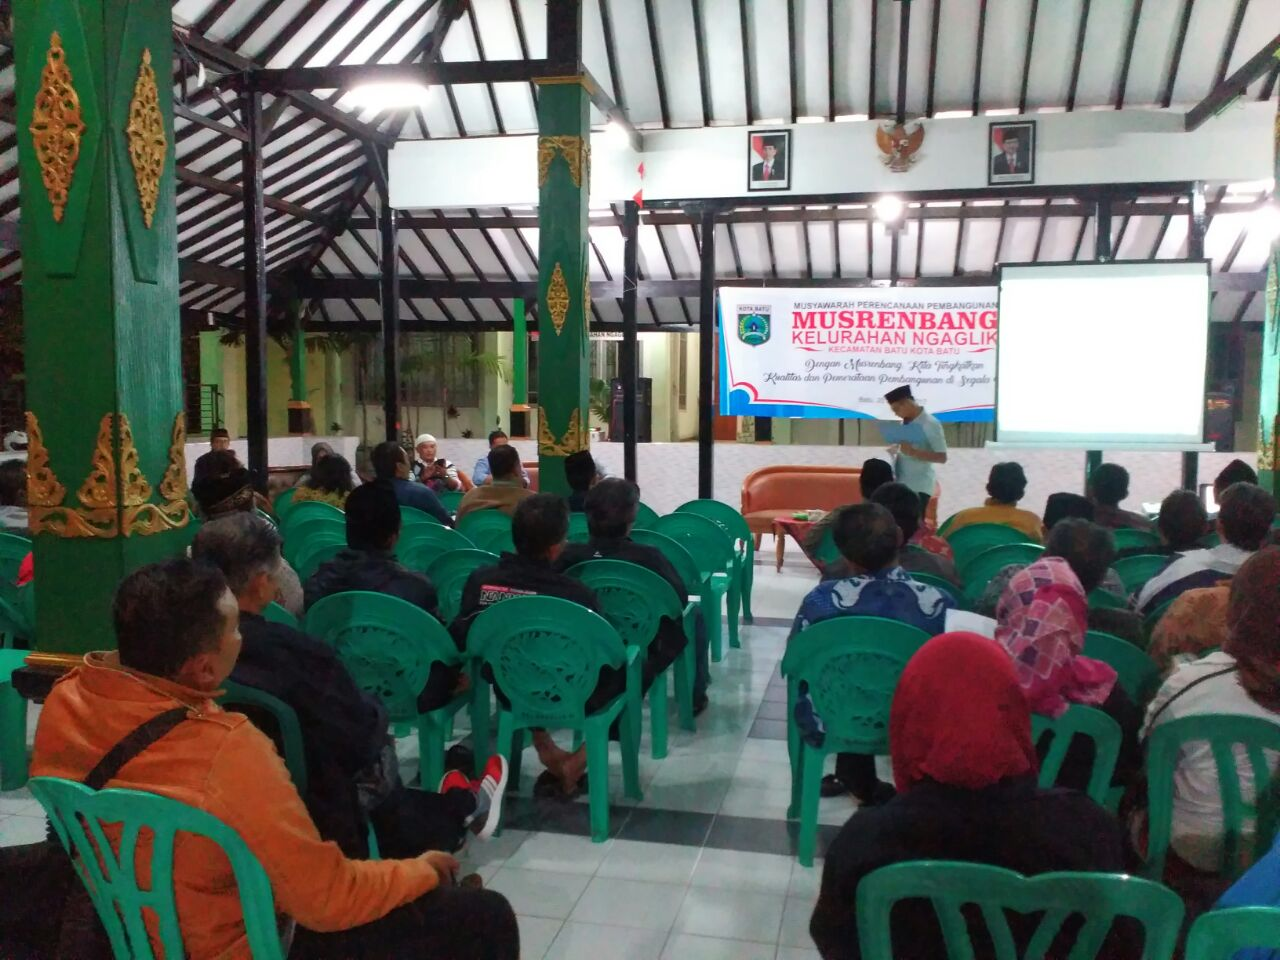 Bhabinkamtibmas Kelurahan Ngaglik Polsek Batu Kota Hadiri Kegiatan Musrenbang Kelurahan Ngaglik Tahun 2017